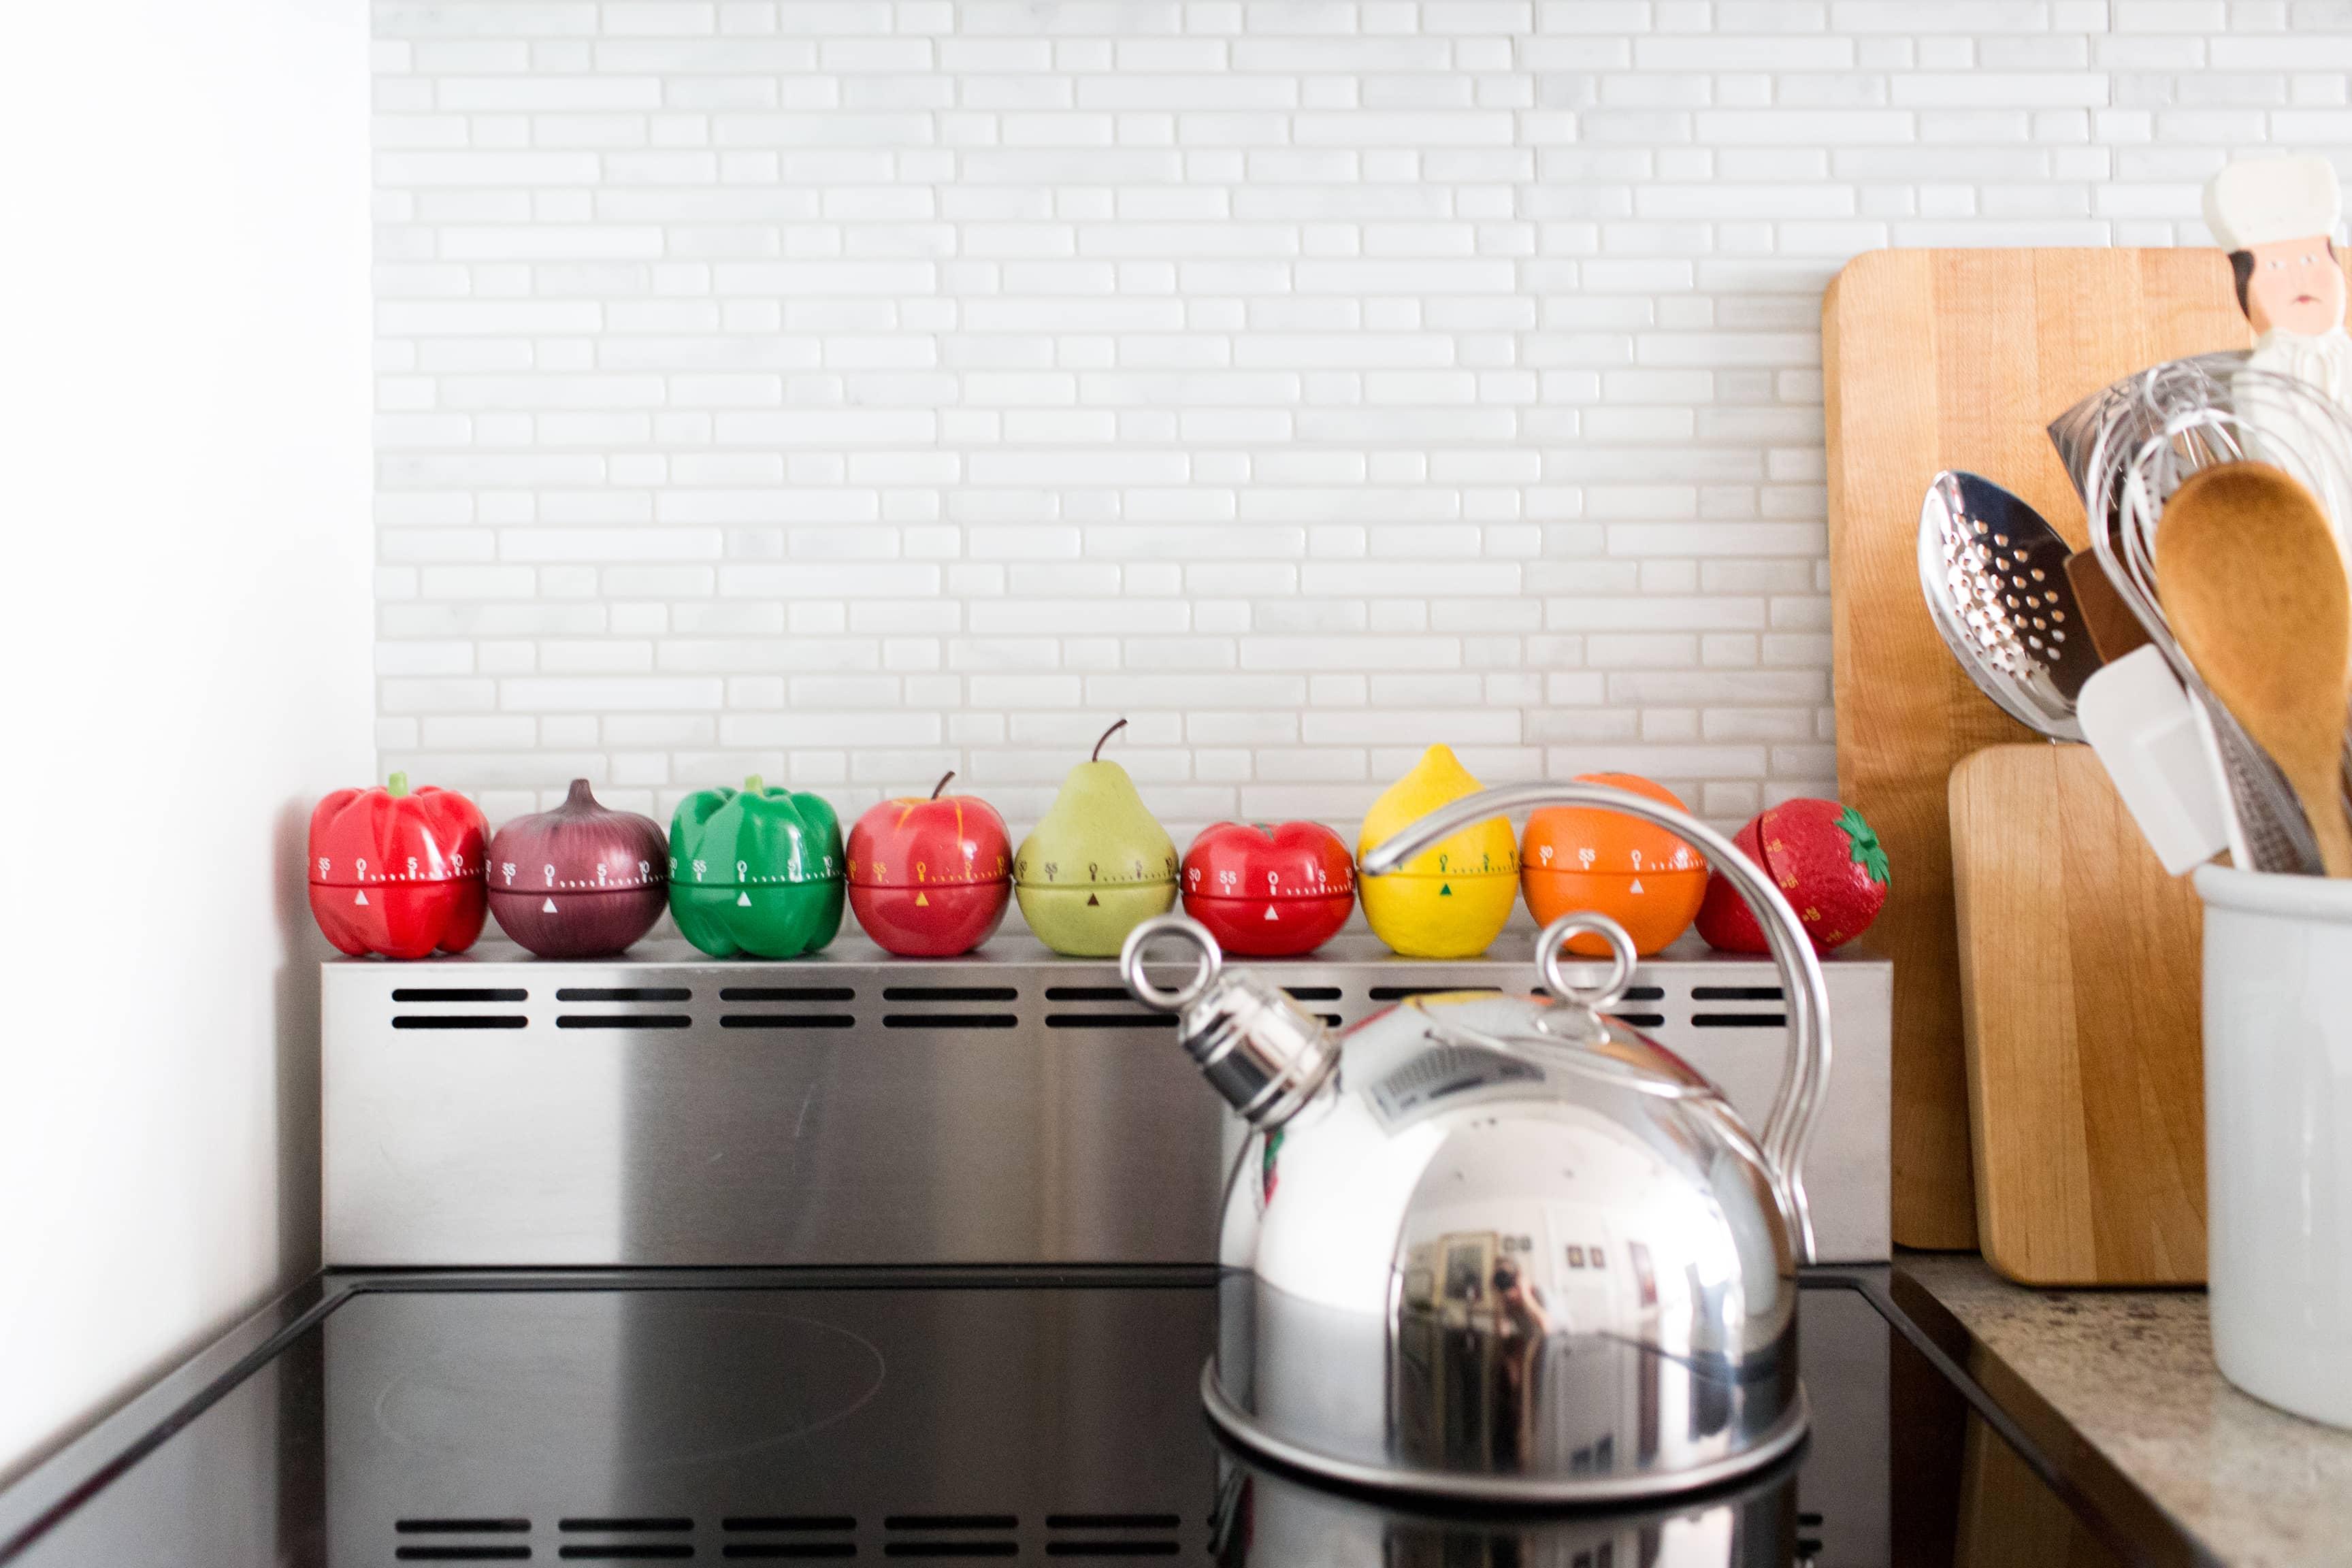 8 Ways to Cover an Old Tile Backsplash You | Apartment Therapy Ugly Kitchen Tile Backsplash on ugly kitchen counters, ugly kitchen cabinets, ugly kitchen flooring, ugly kitchen lighting, ugly kitchen sink, ugly kitchen faucets, ugly kitchen appliances,